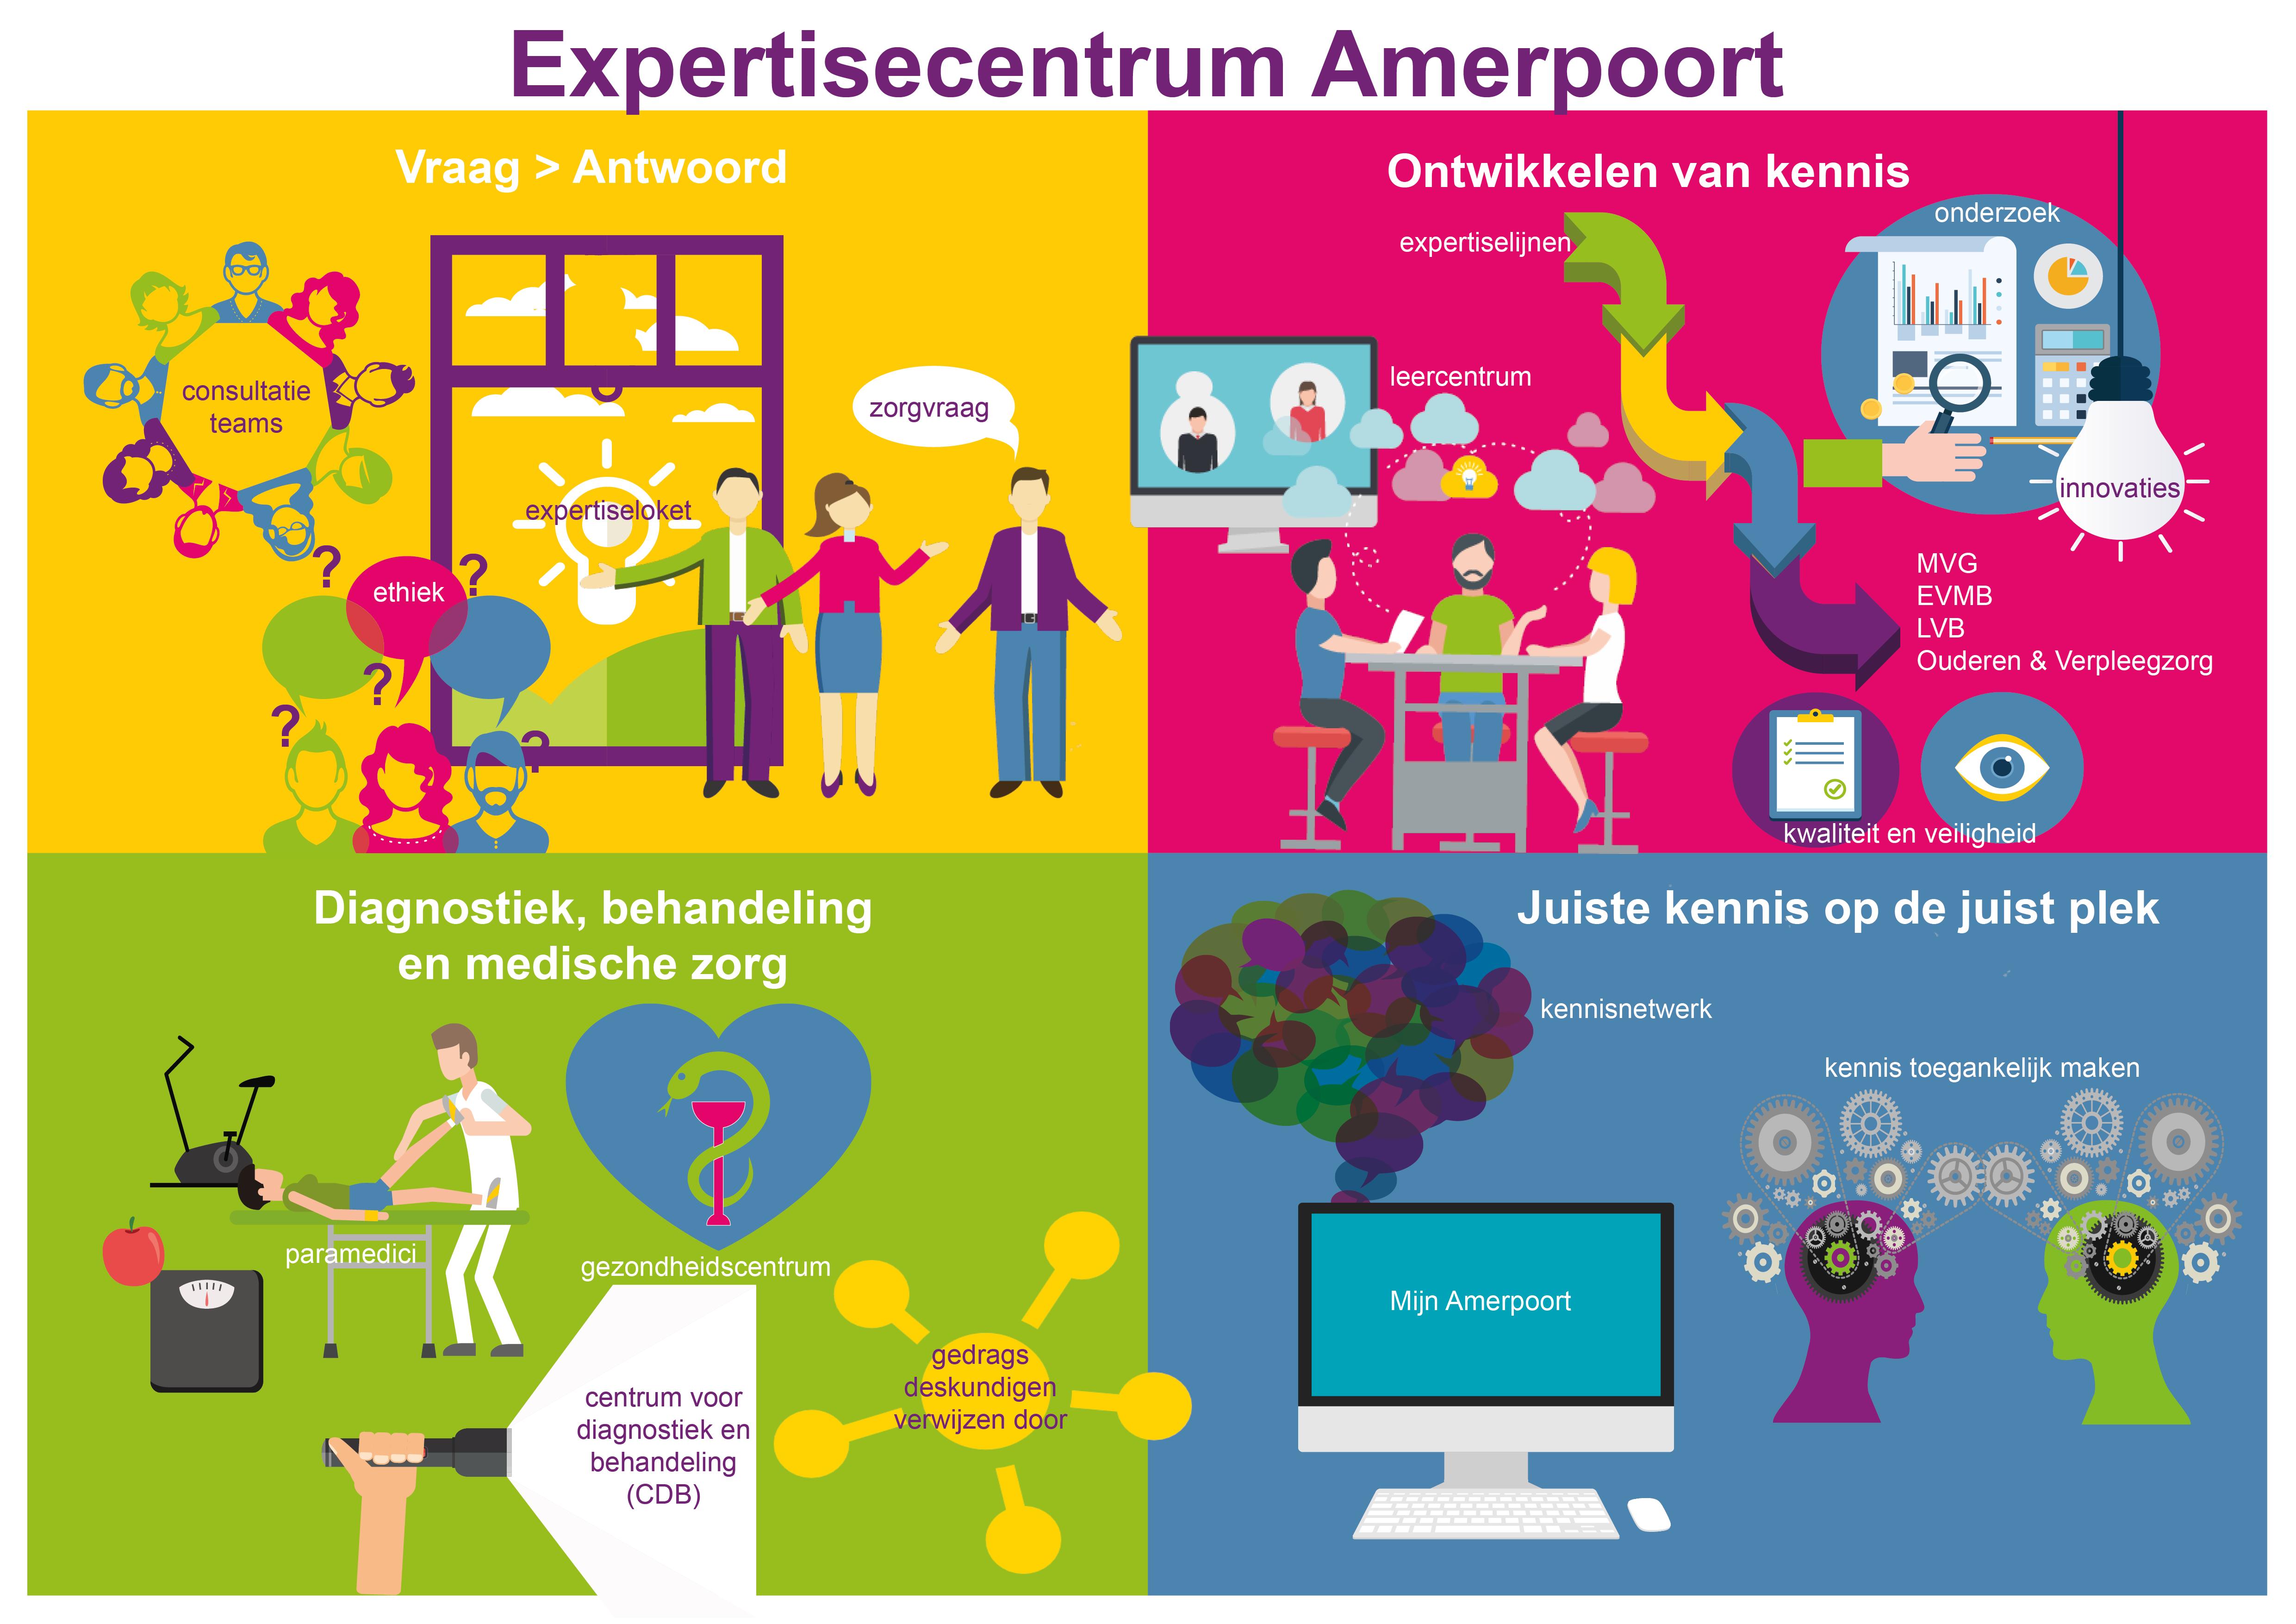 Infographic Expertisecentrum Amerpoort